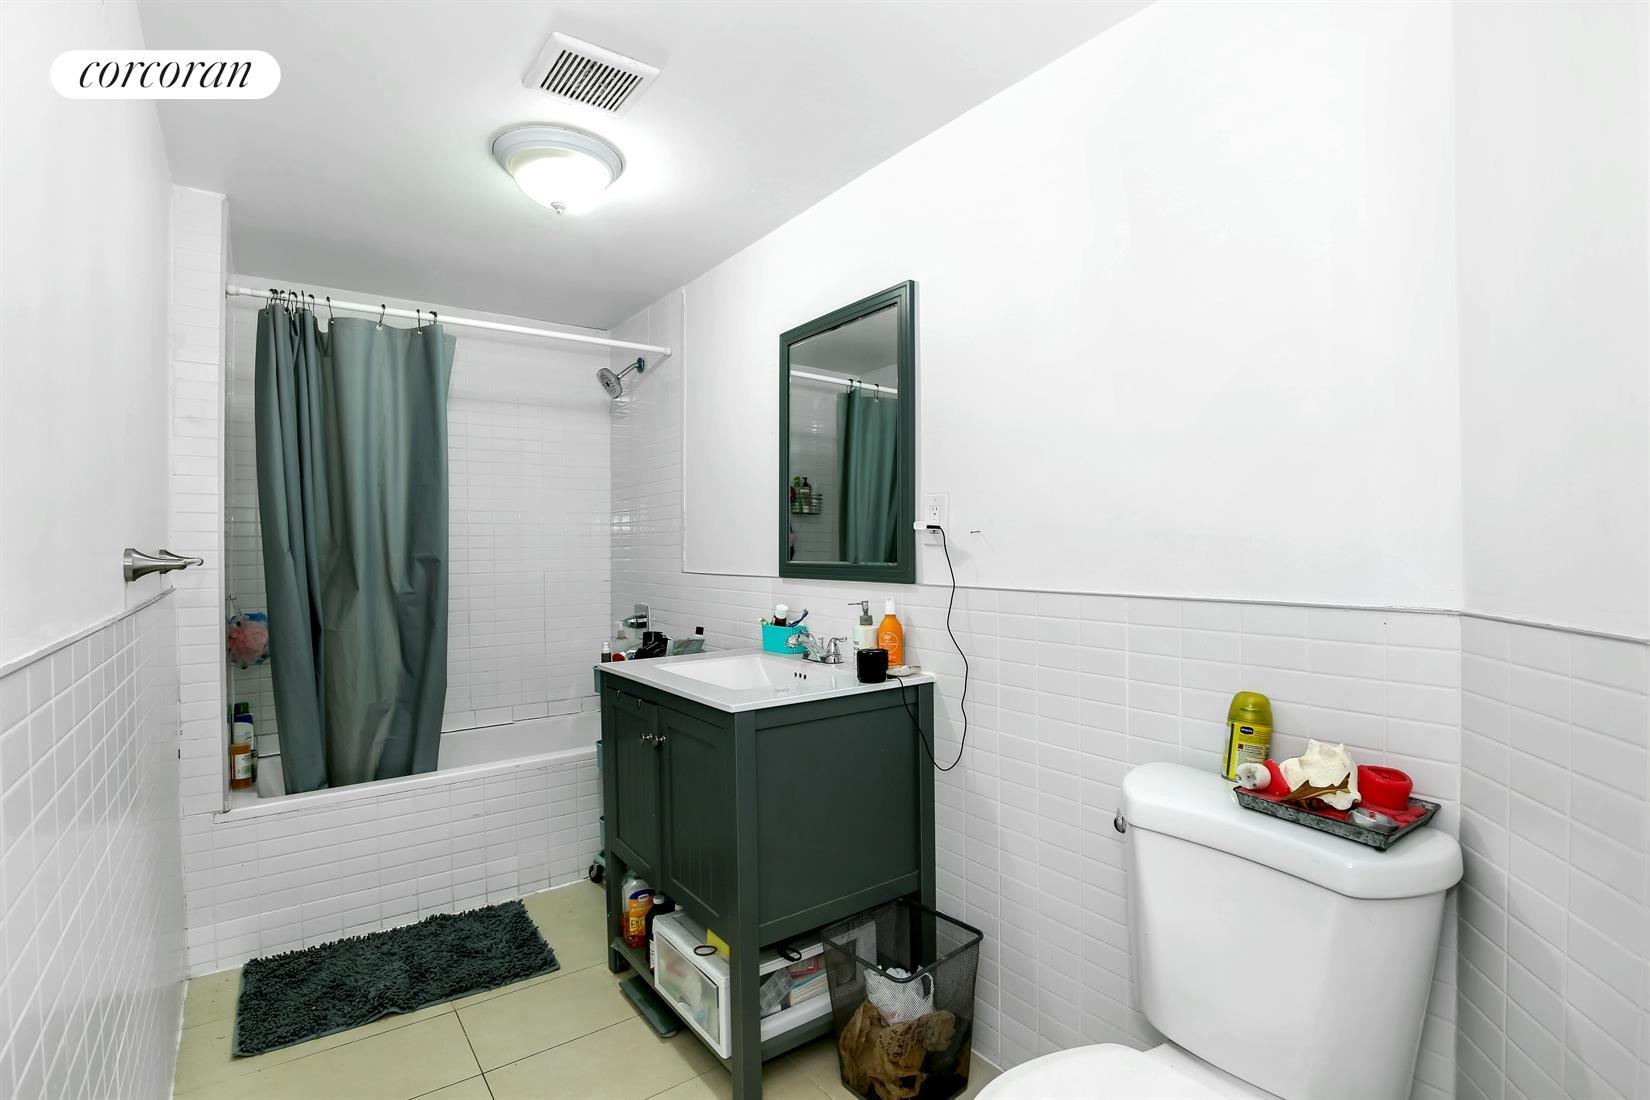 Corcoran, 86 Cooper Street, Bushwick Real Estate, Brooklyn For Sale ...